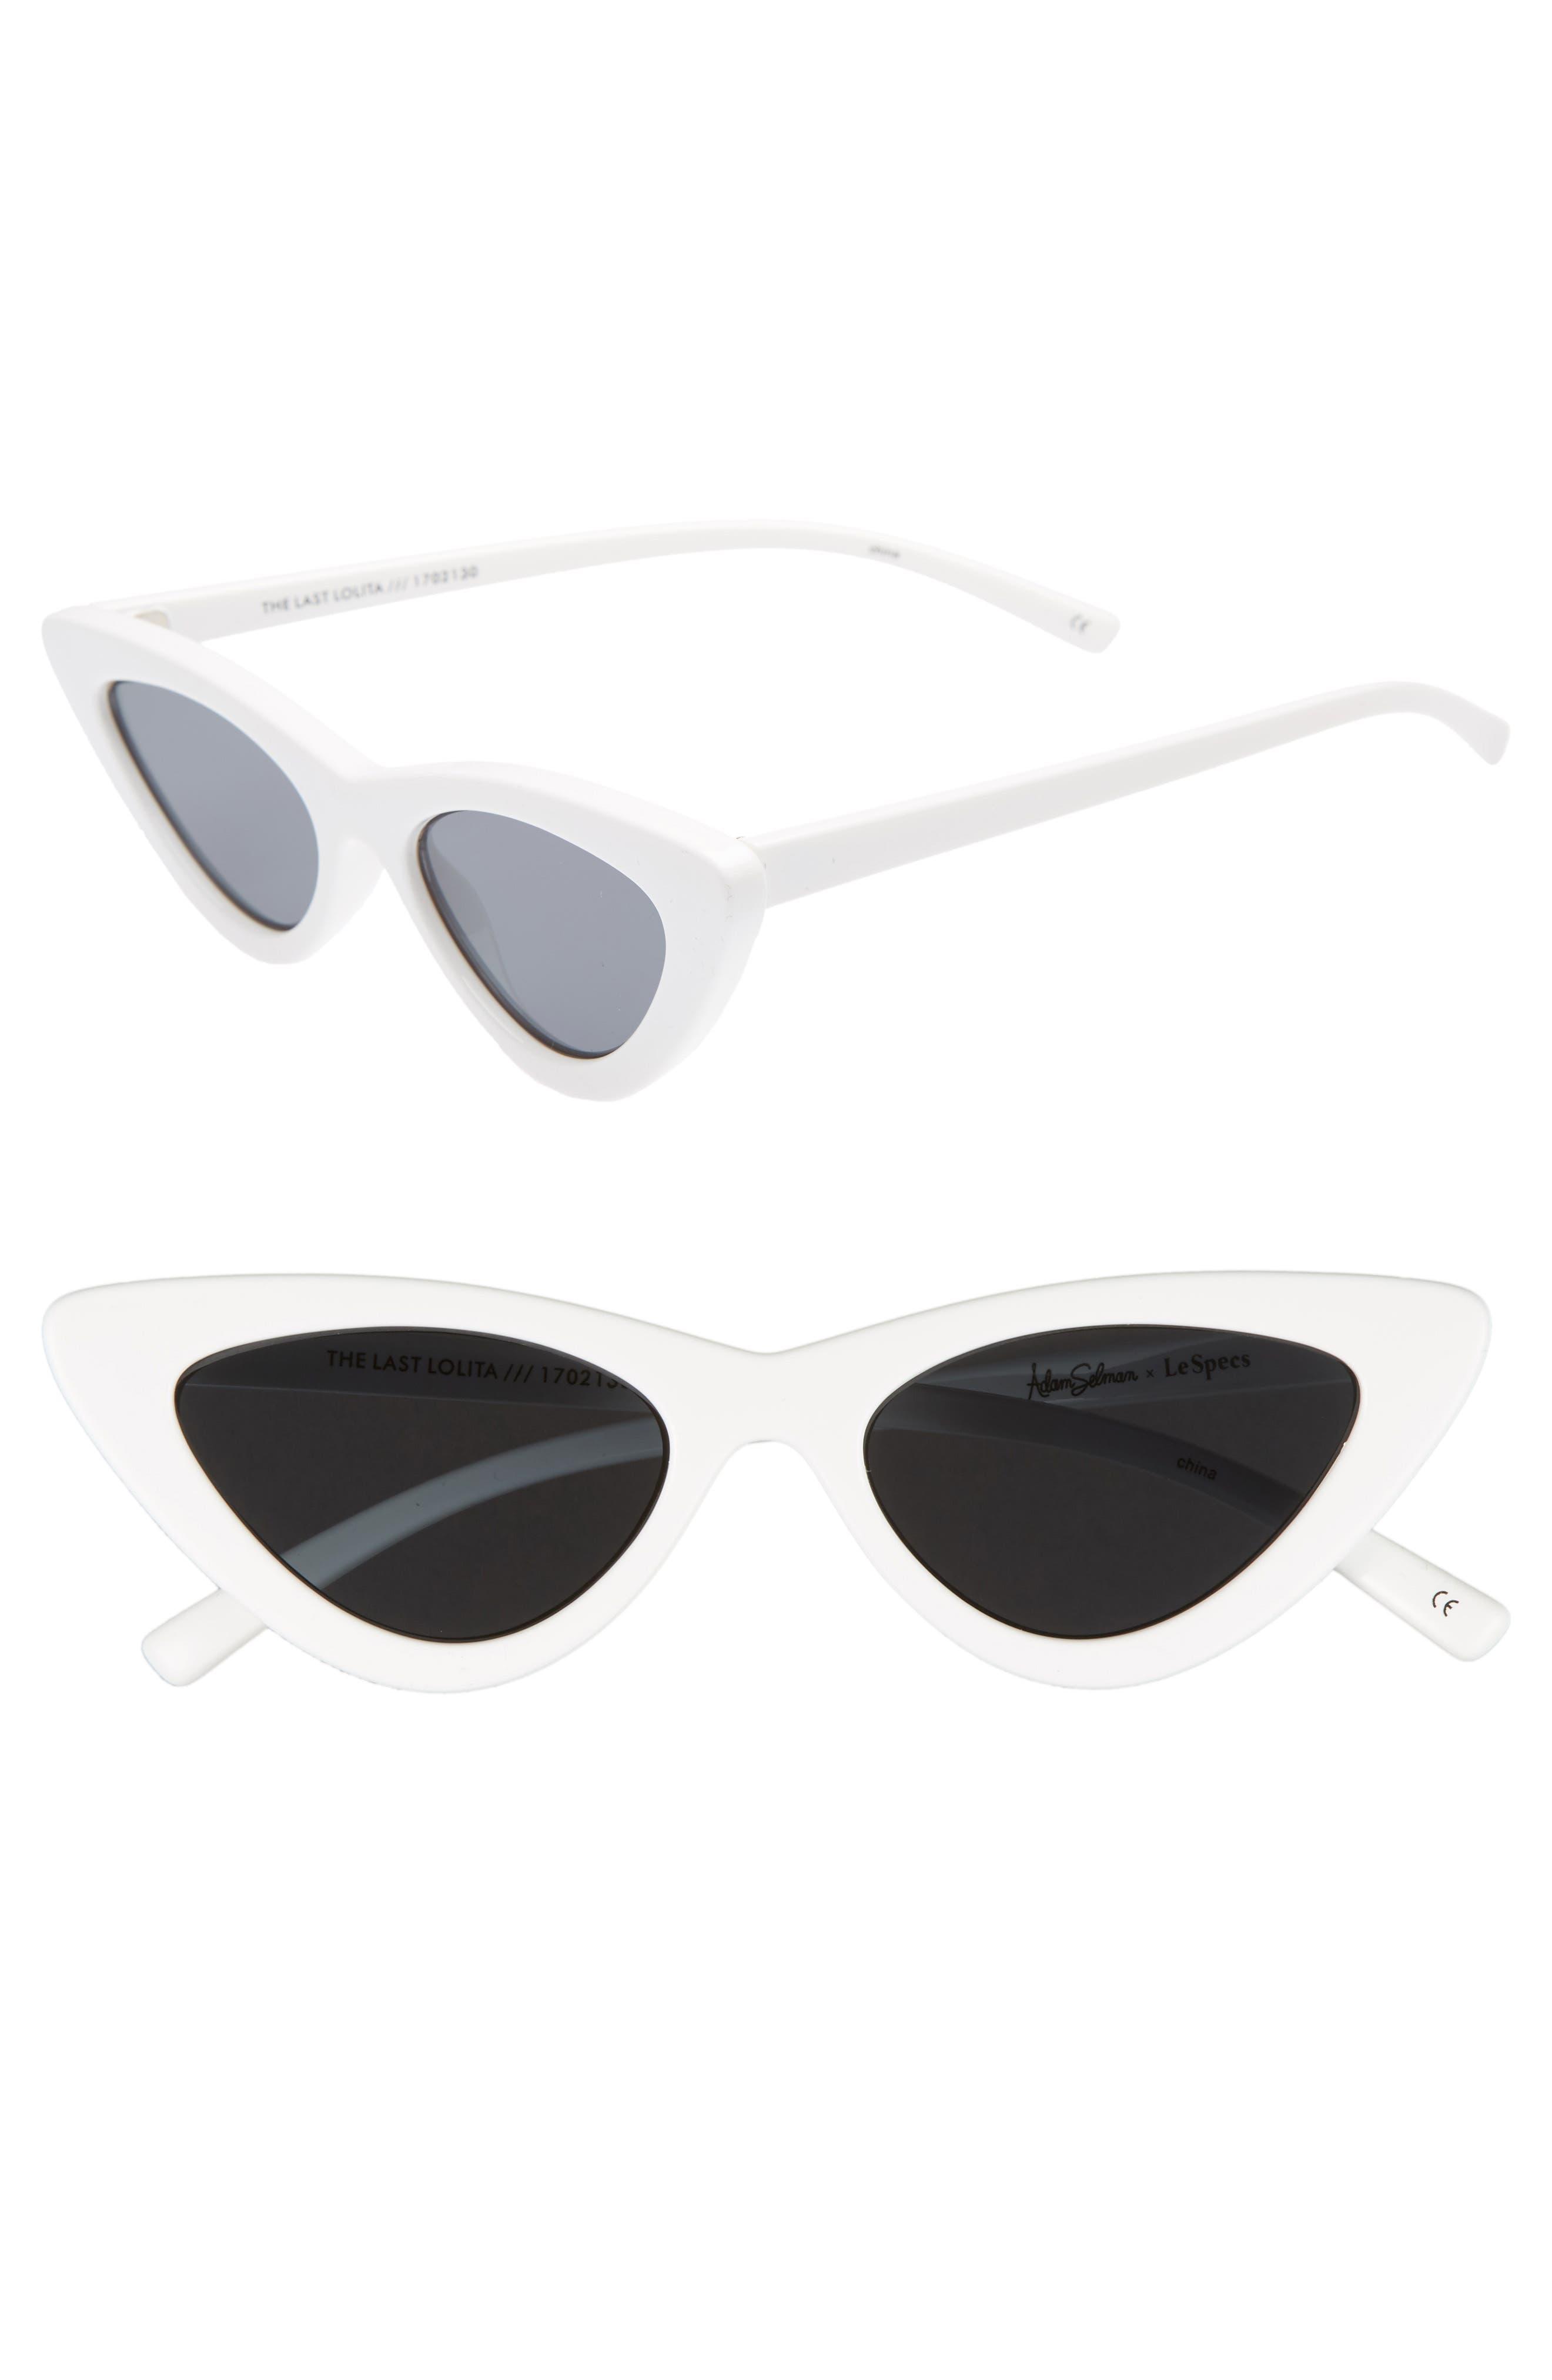 Adam Selman X Le Specs Luxe Lolita 4m Cat Eye Sunglasses - White